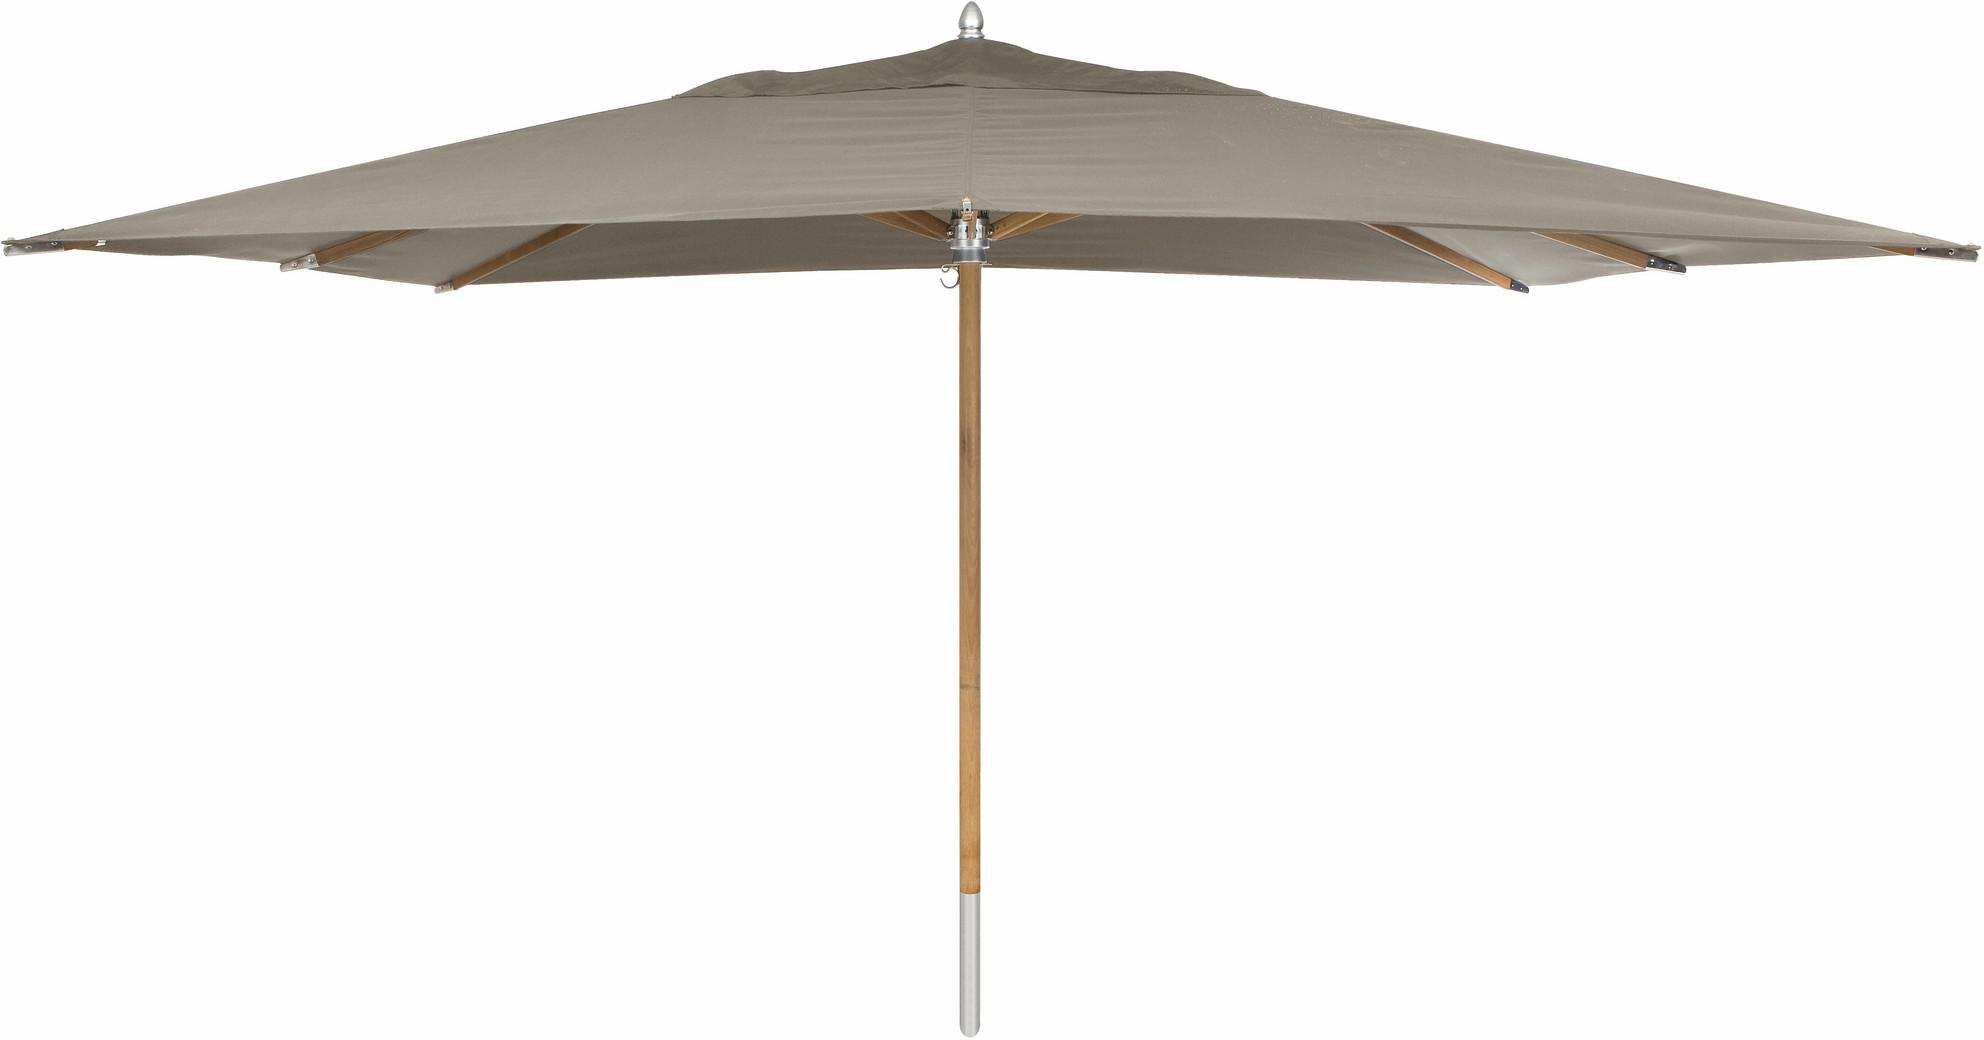 Umbrella central pole teak 300*400 taupe